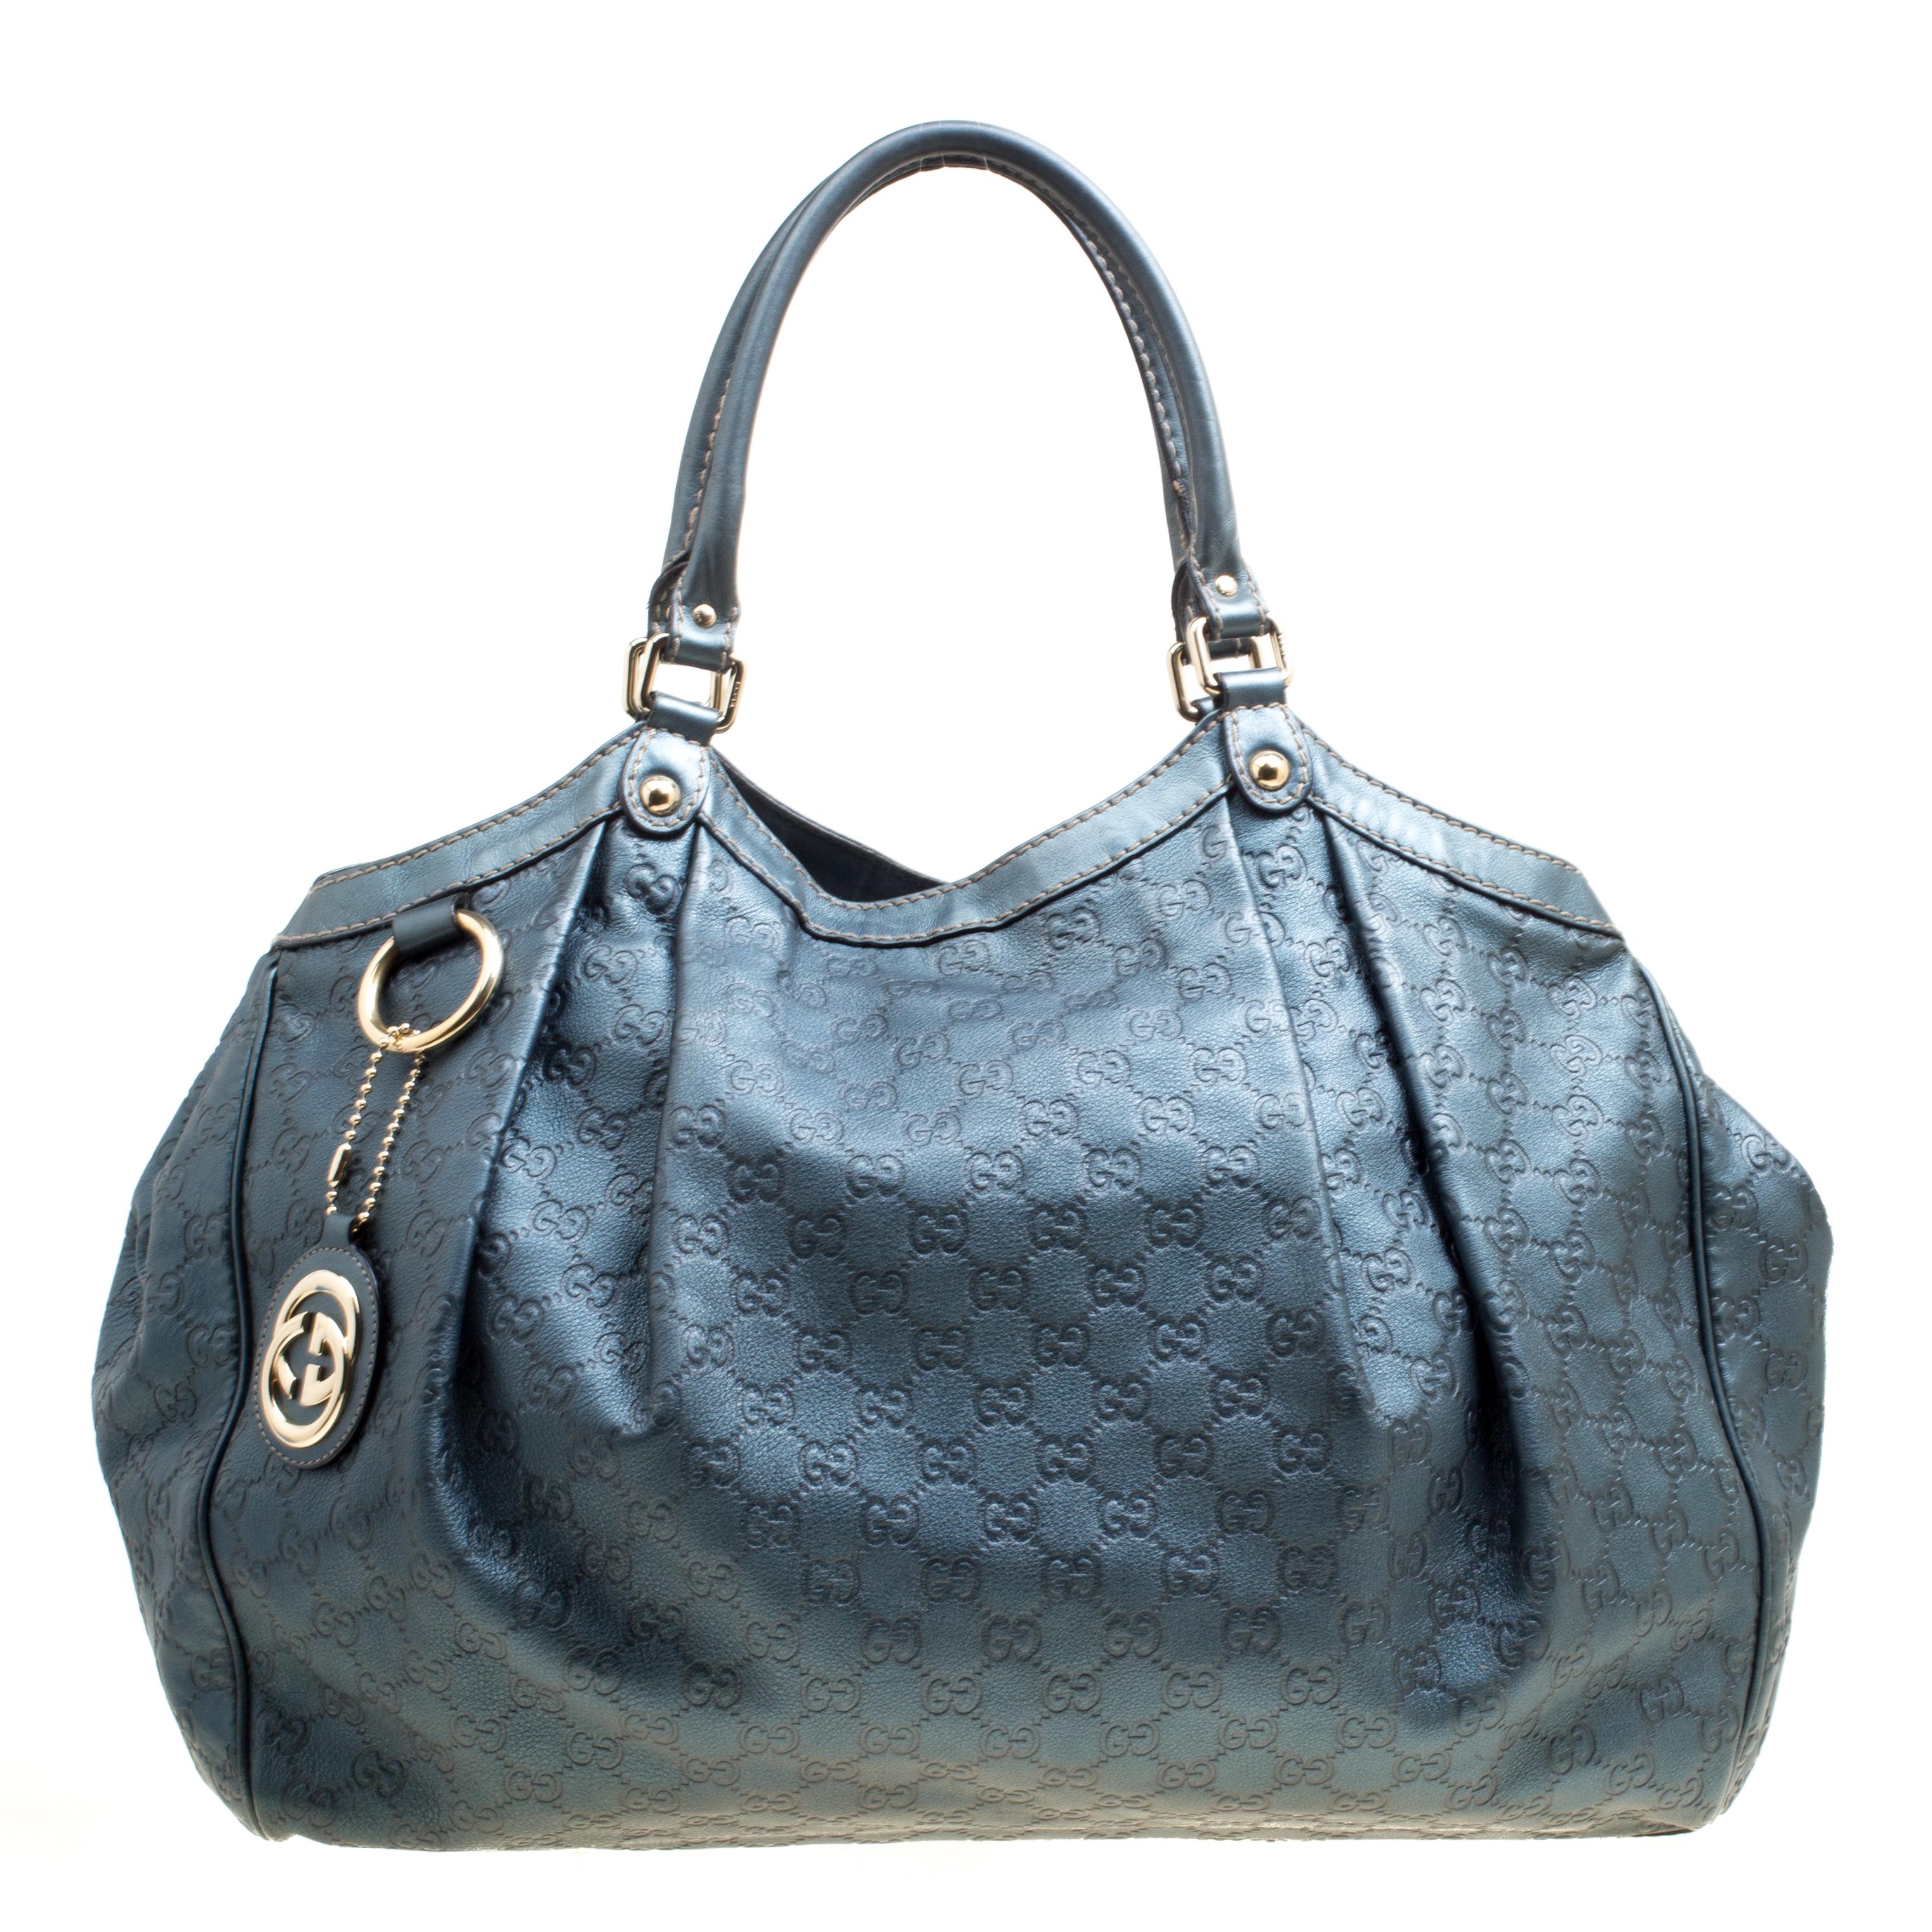 04222027e093 Buy Gucci Metallic Blue Guccissima Large Sukey Tote 167365 at best ...